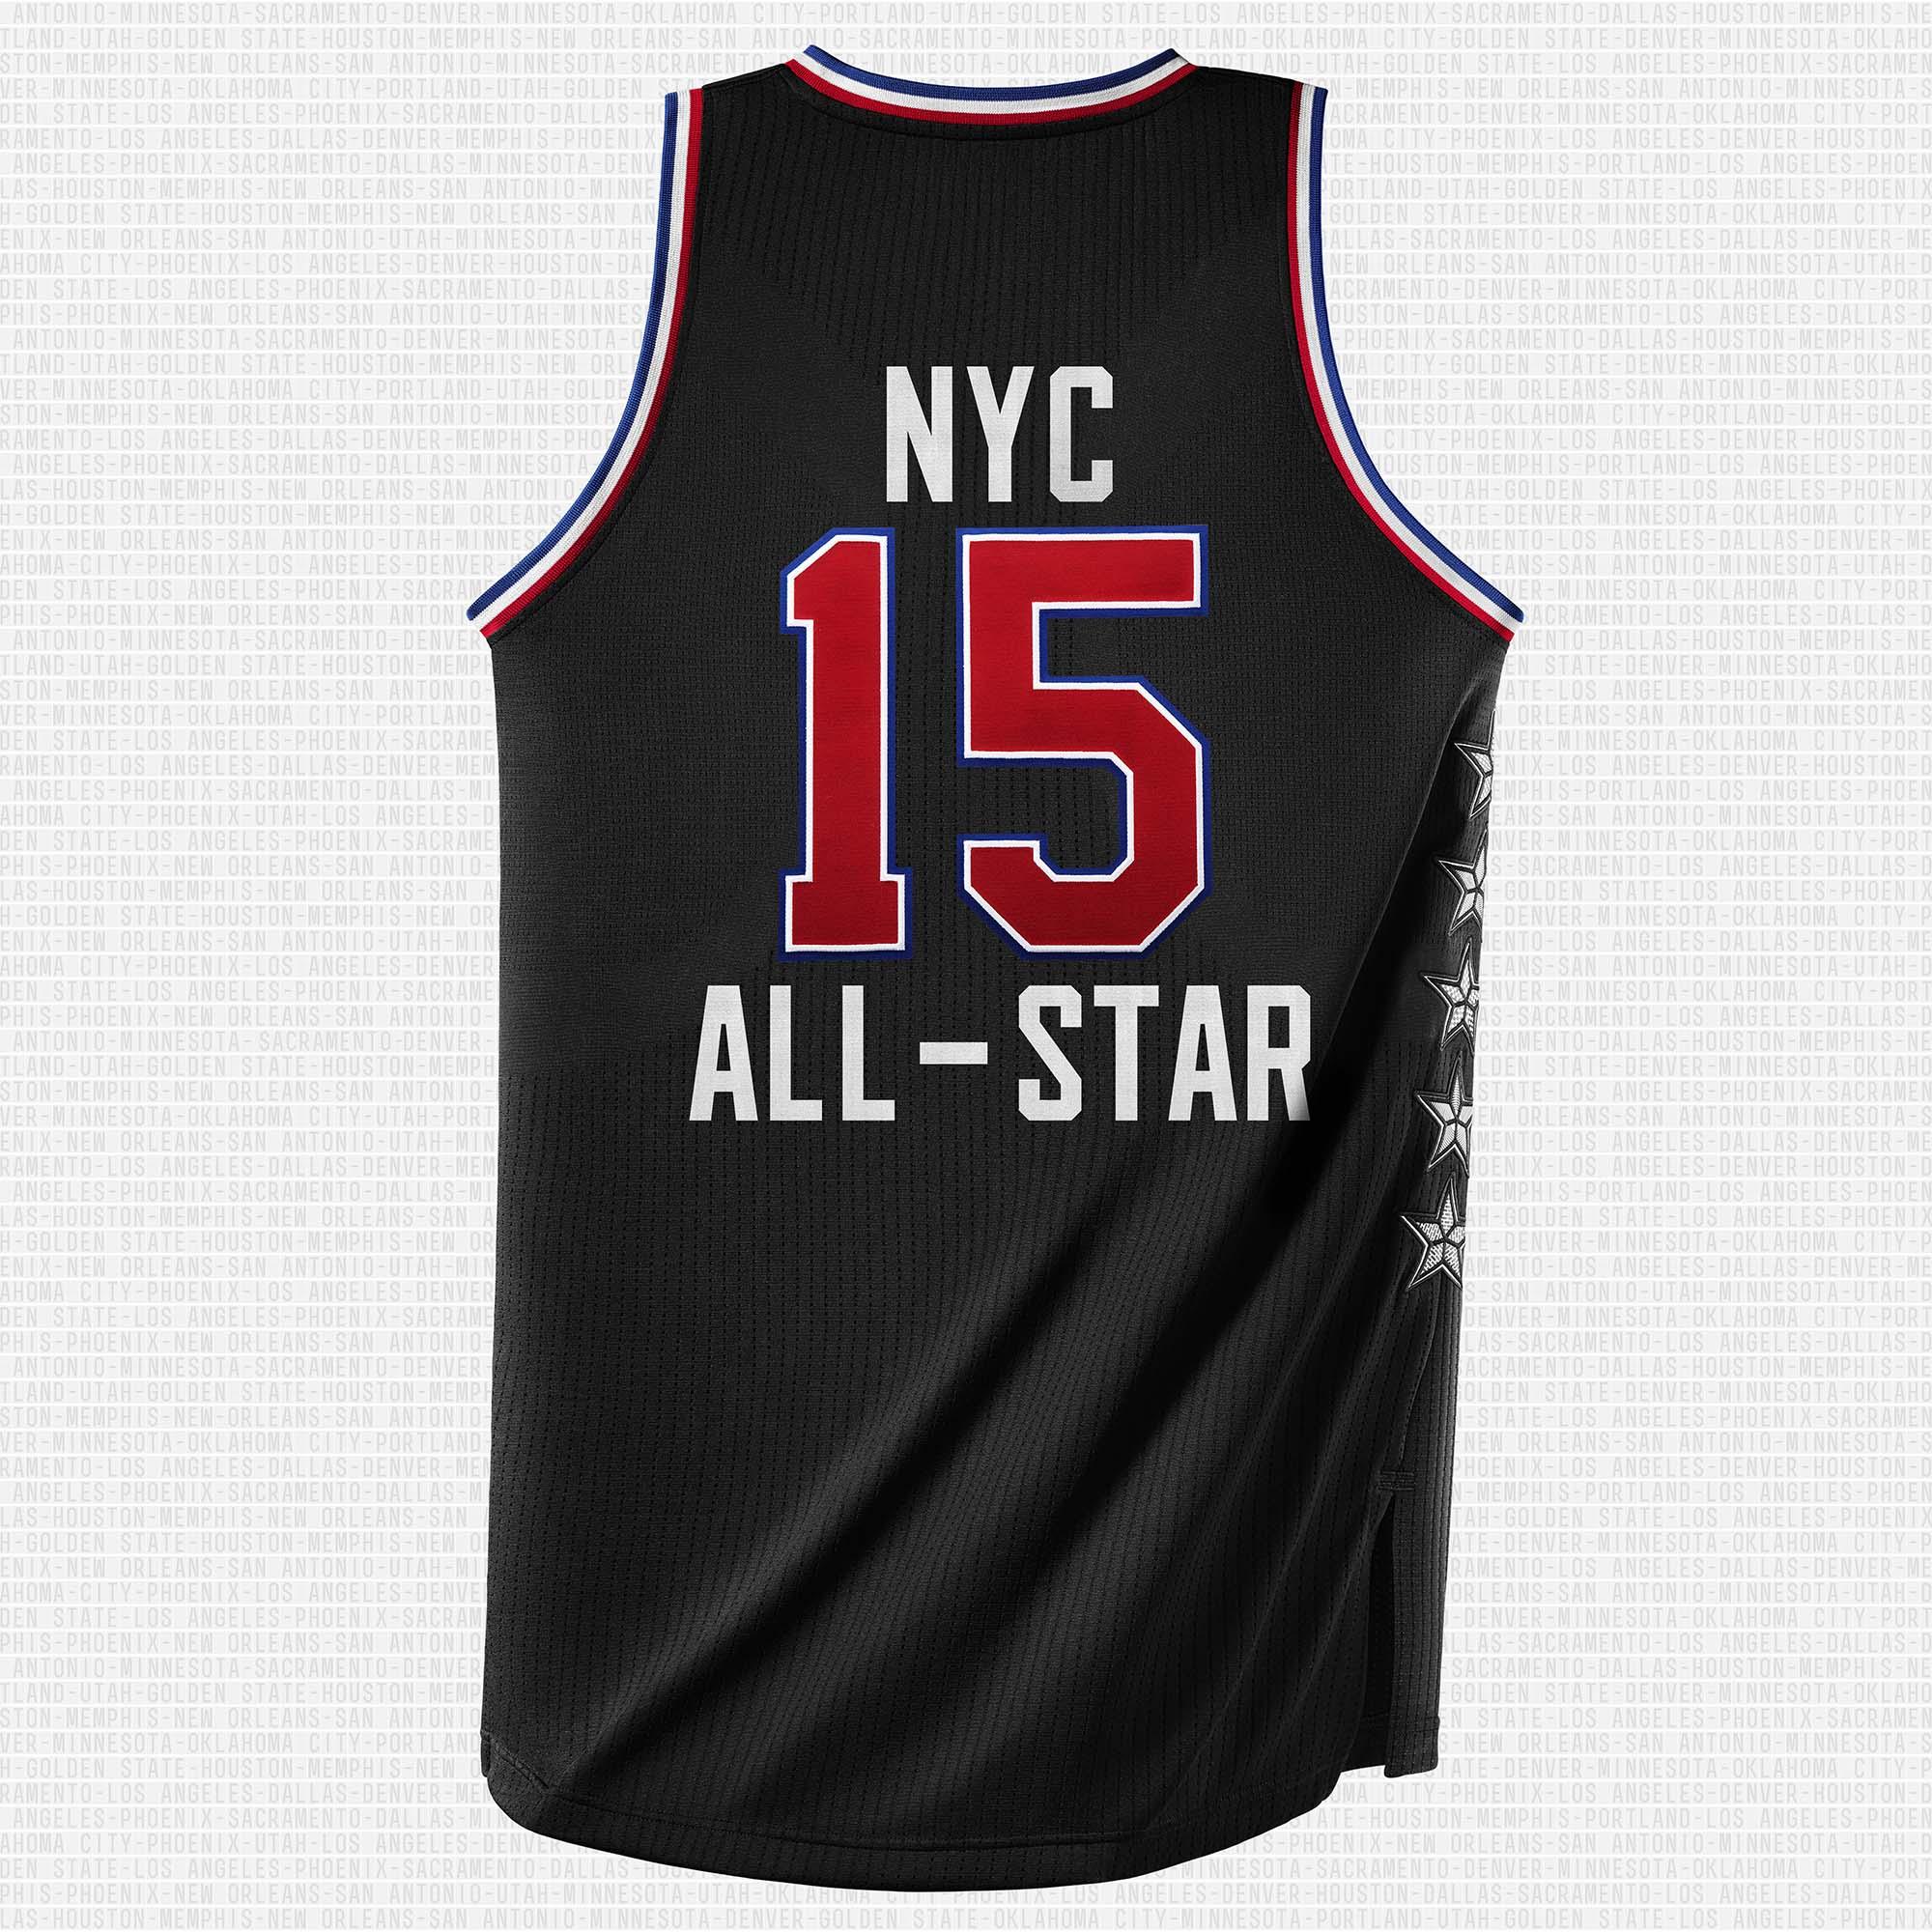 Knicks Basketball Uniforms